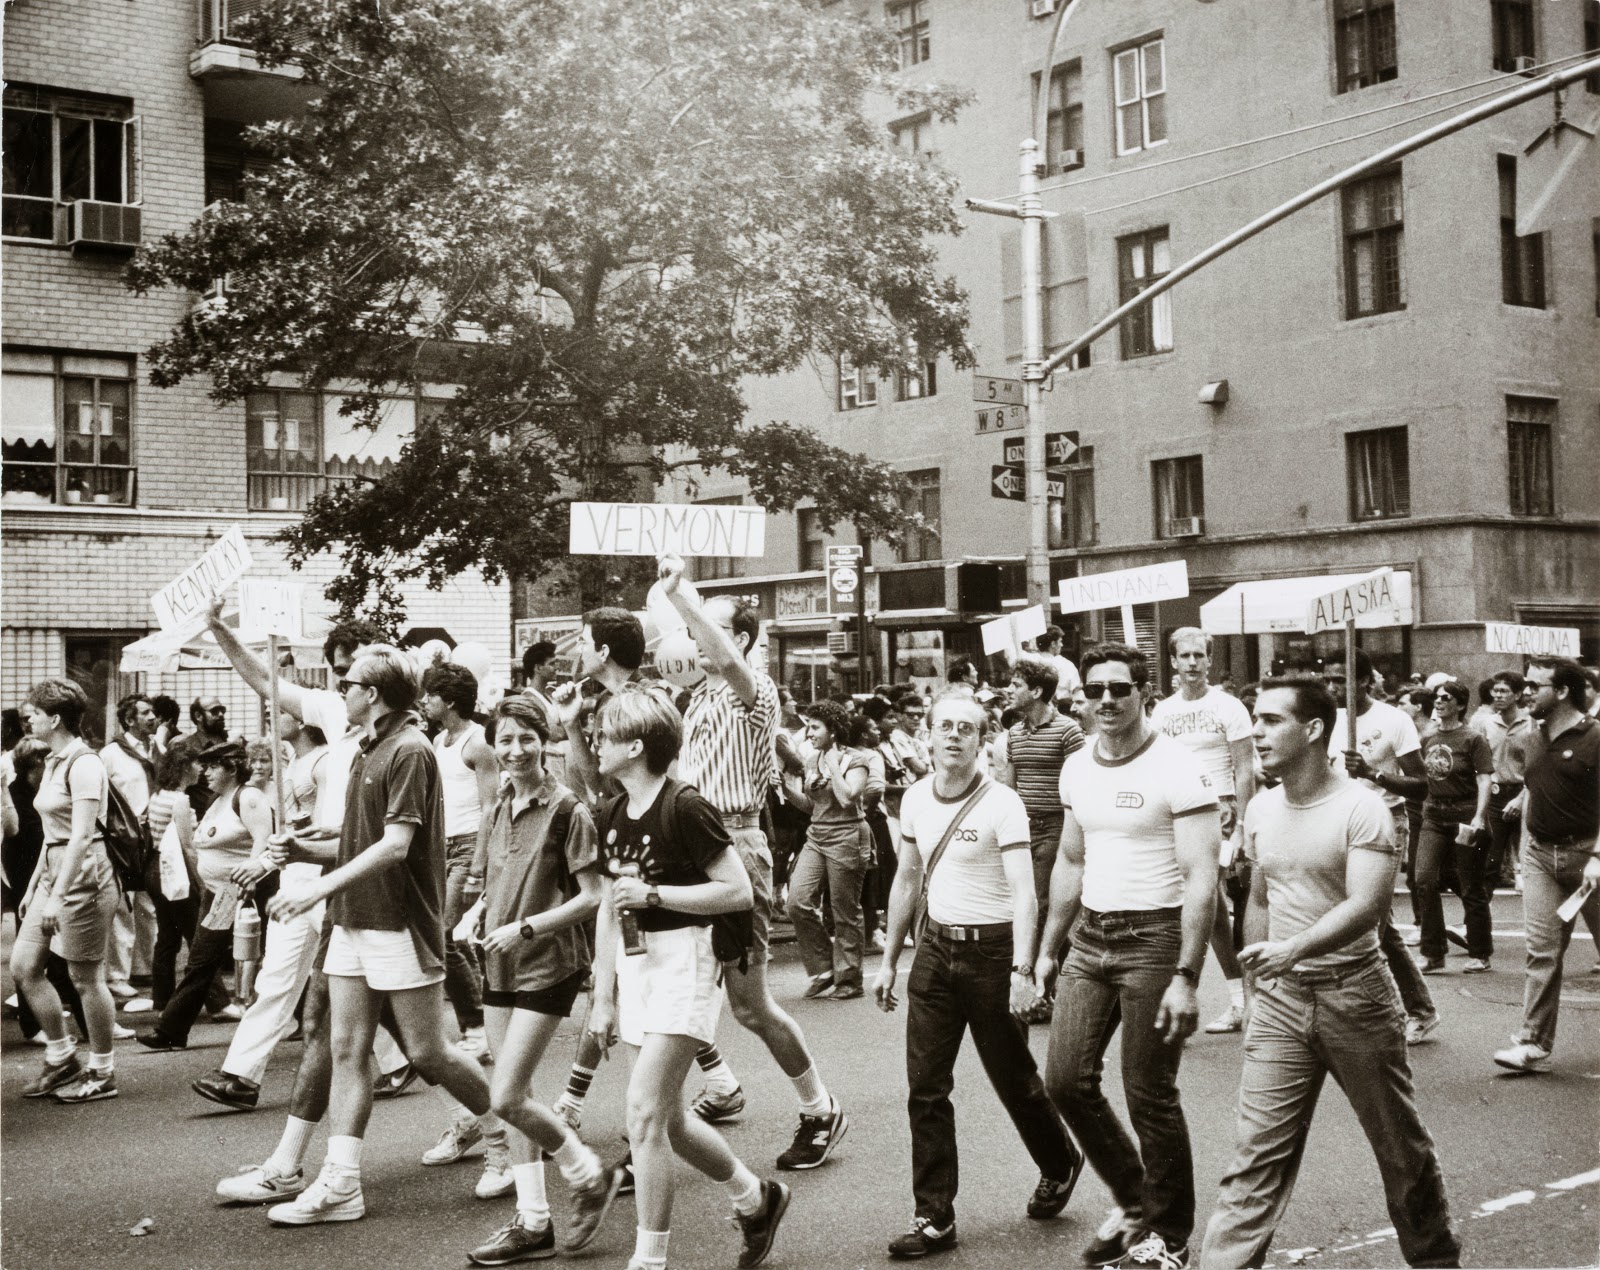 Andy Warhol photograph : Gay Pride, 1976-87